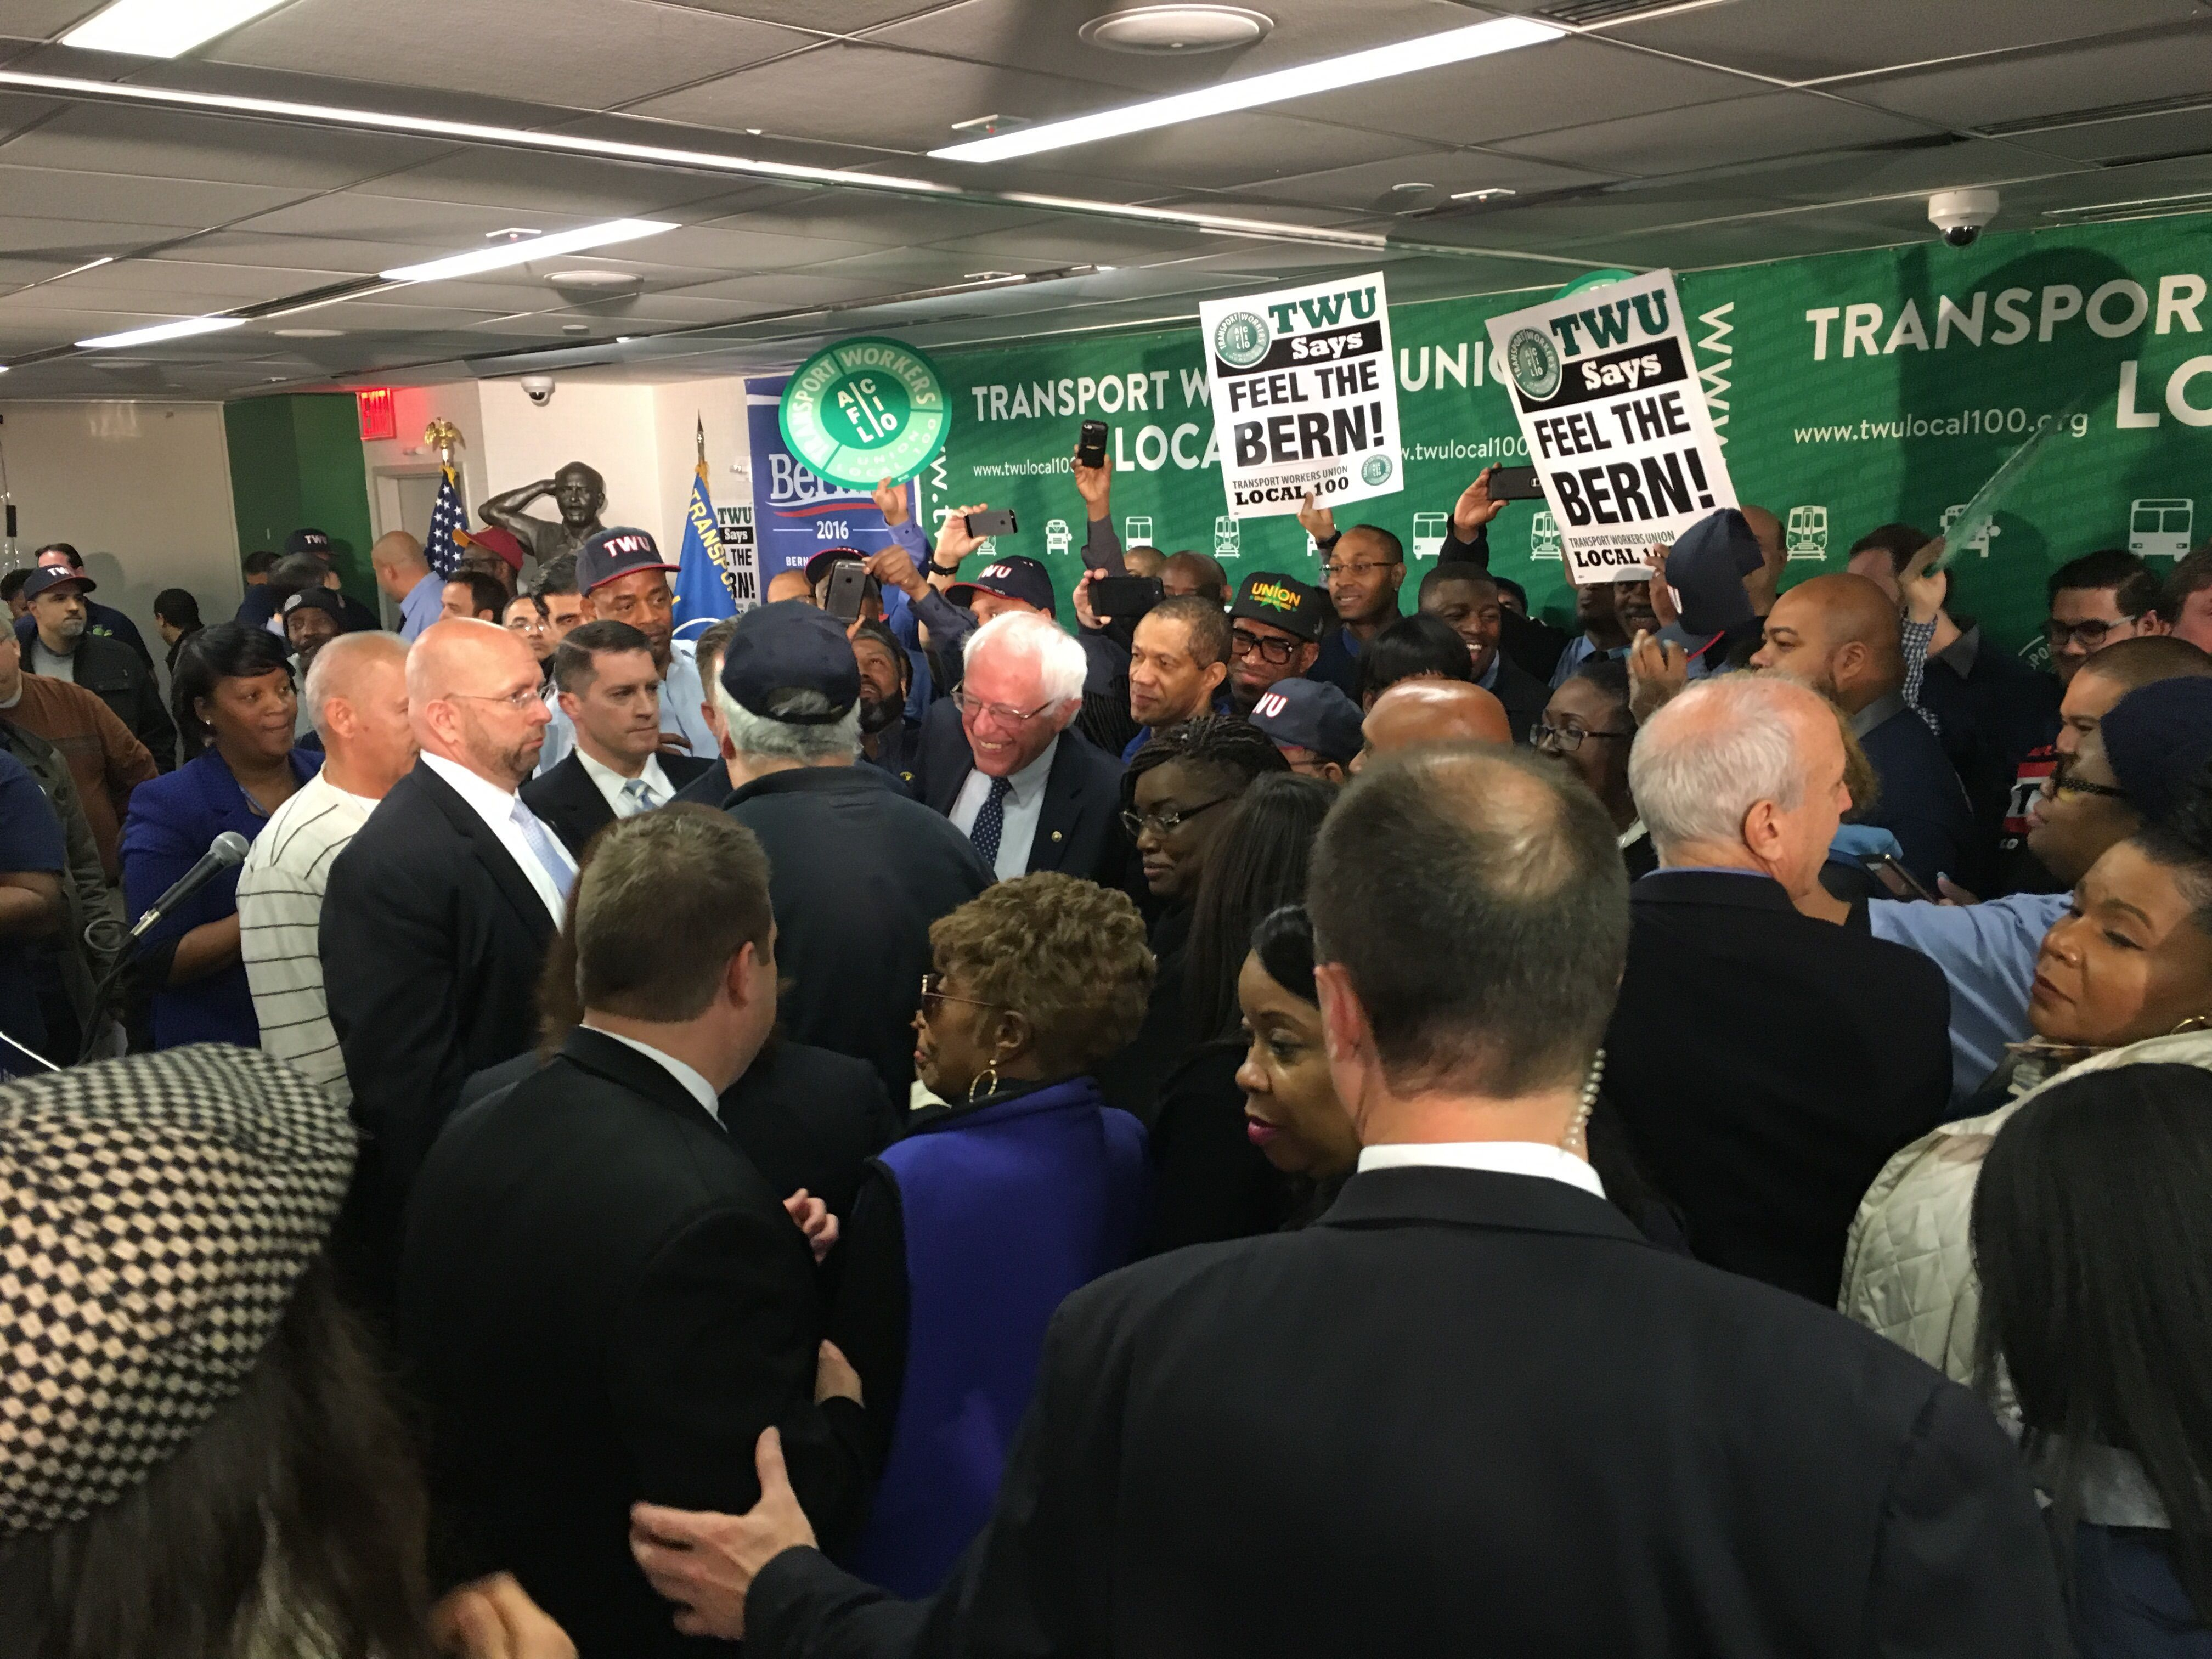 Bernie Sanders Just Scored a Powerful Endorsement in NYC